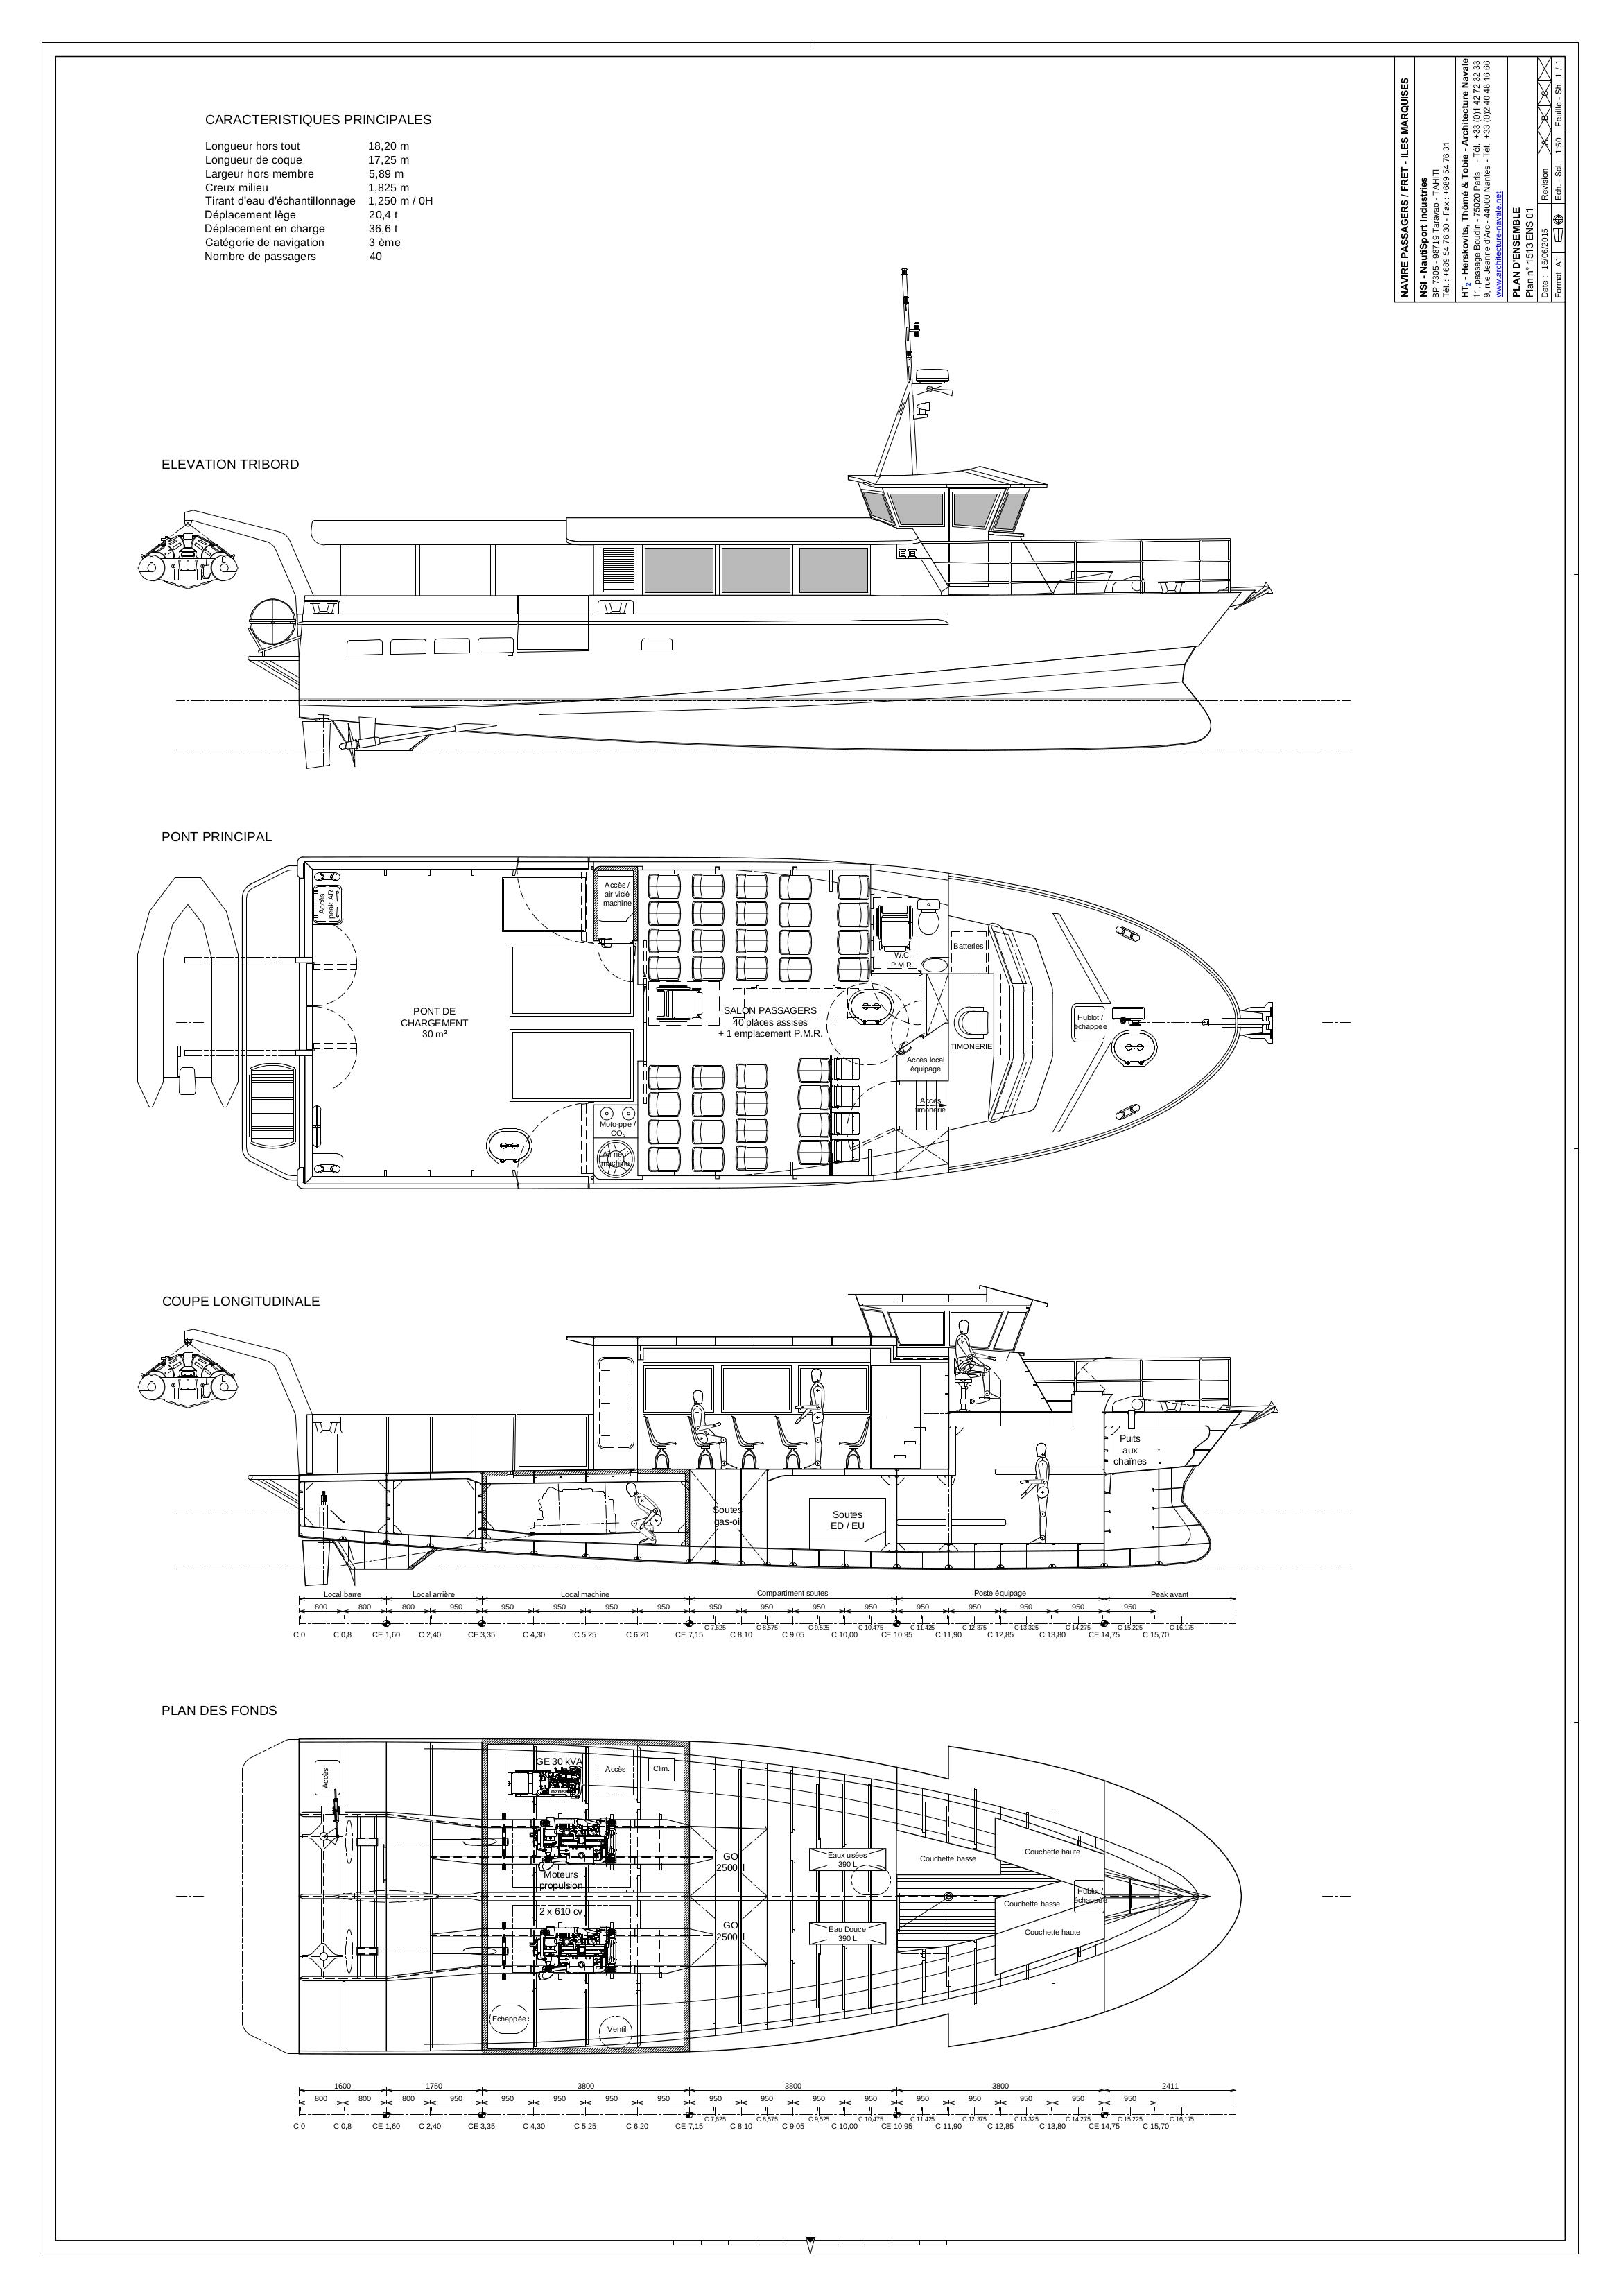 Plan d'ensemble de la navette